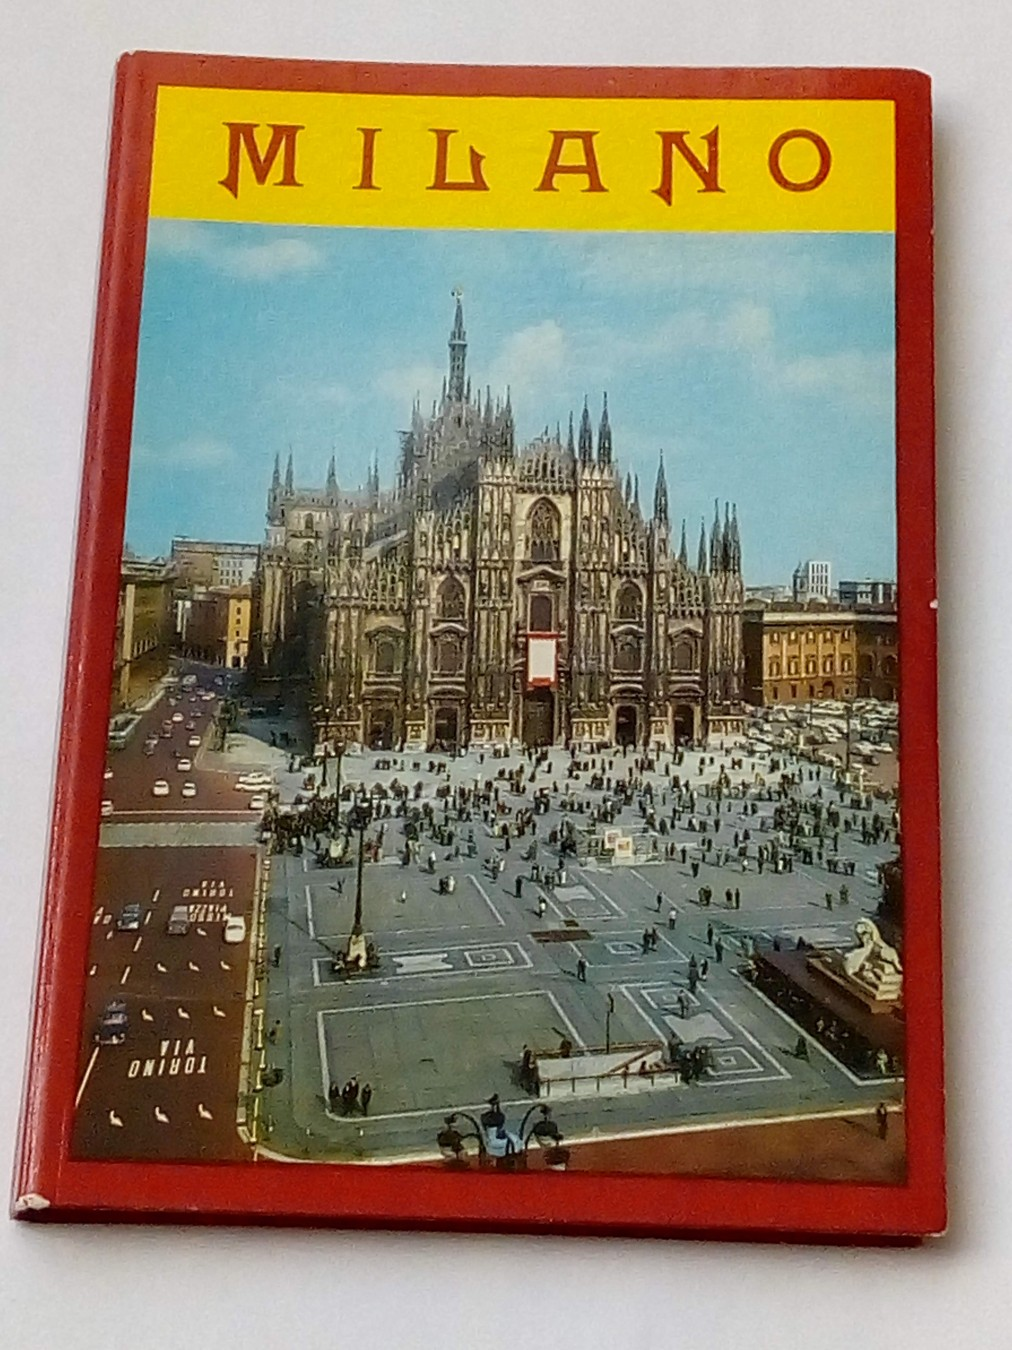 Milano Italija Karta Grada Puno Slika Grada 84346955